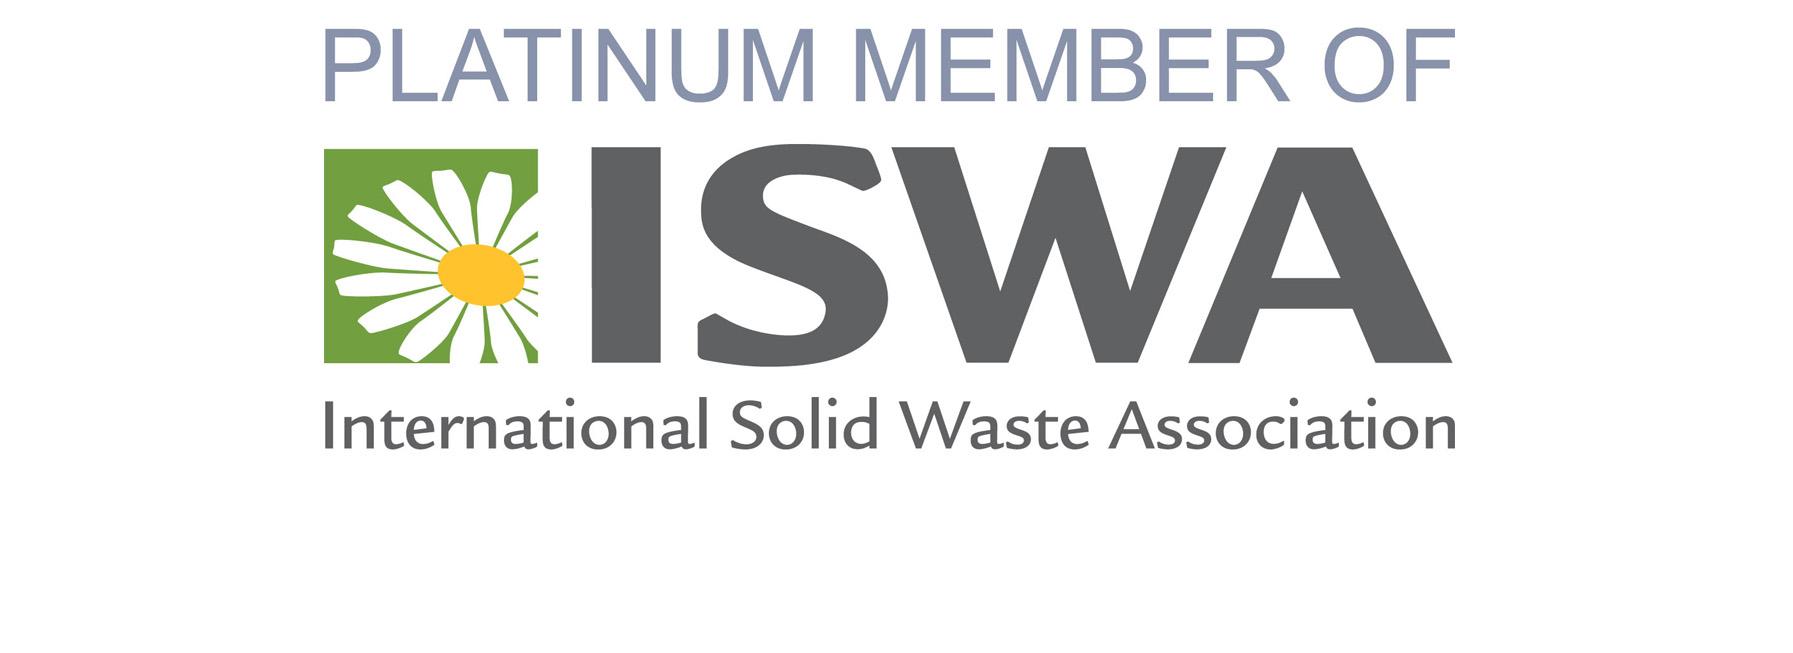 iswa International Solid Waste Association